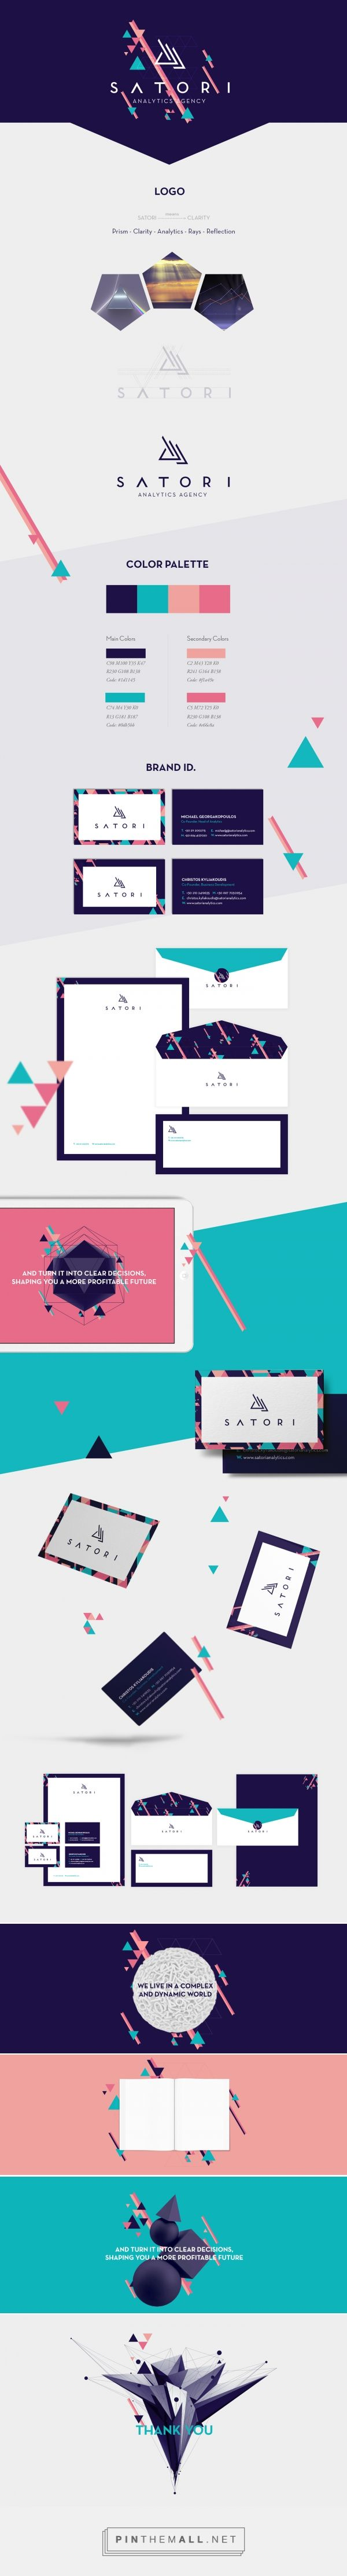 Satori Analytics Agency Branding on Behance   Fivestar Branding – Design and…